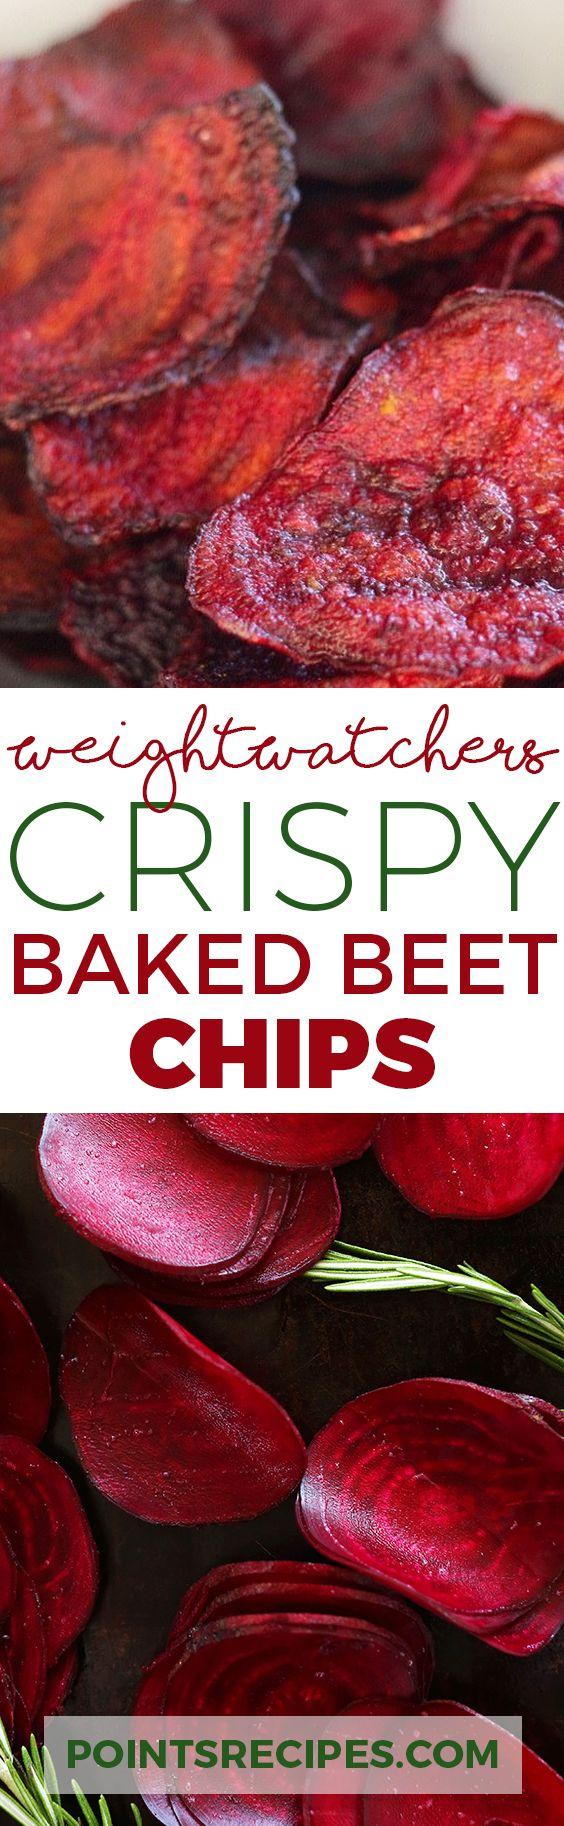 Crispy Baked Beet Chips (Weight Watchers SmartPoints)